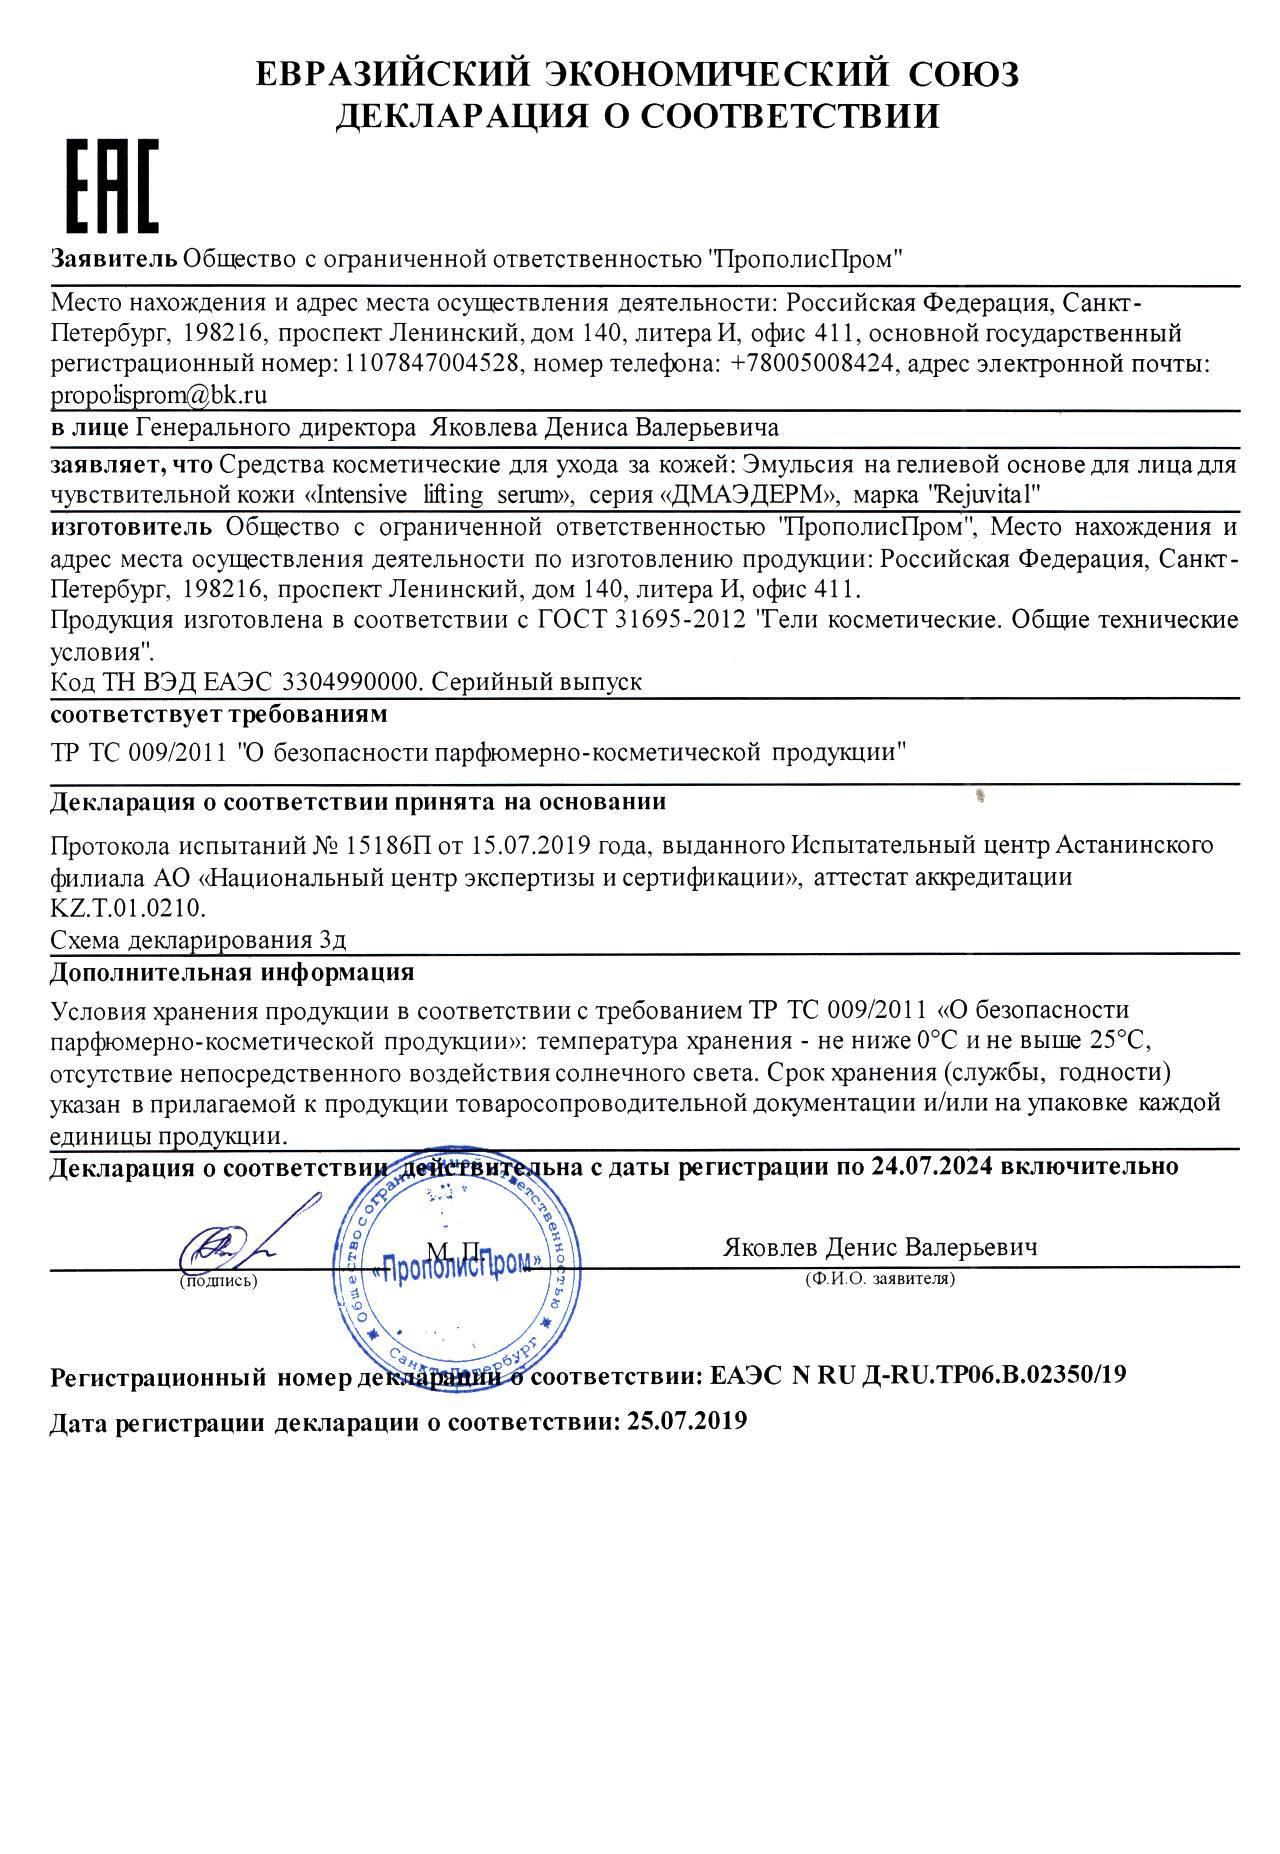 DMAEDERM EXPERT ANTI-AGE Сыворотка - Декларация соответствия